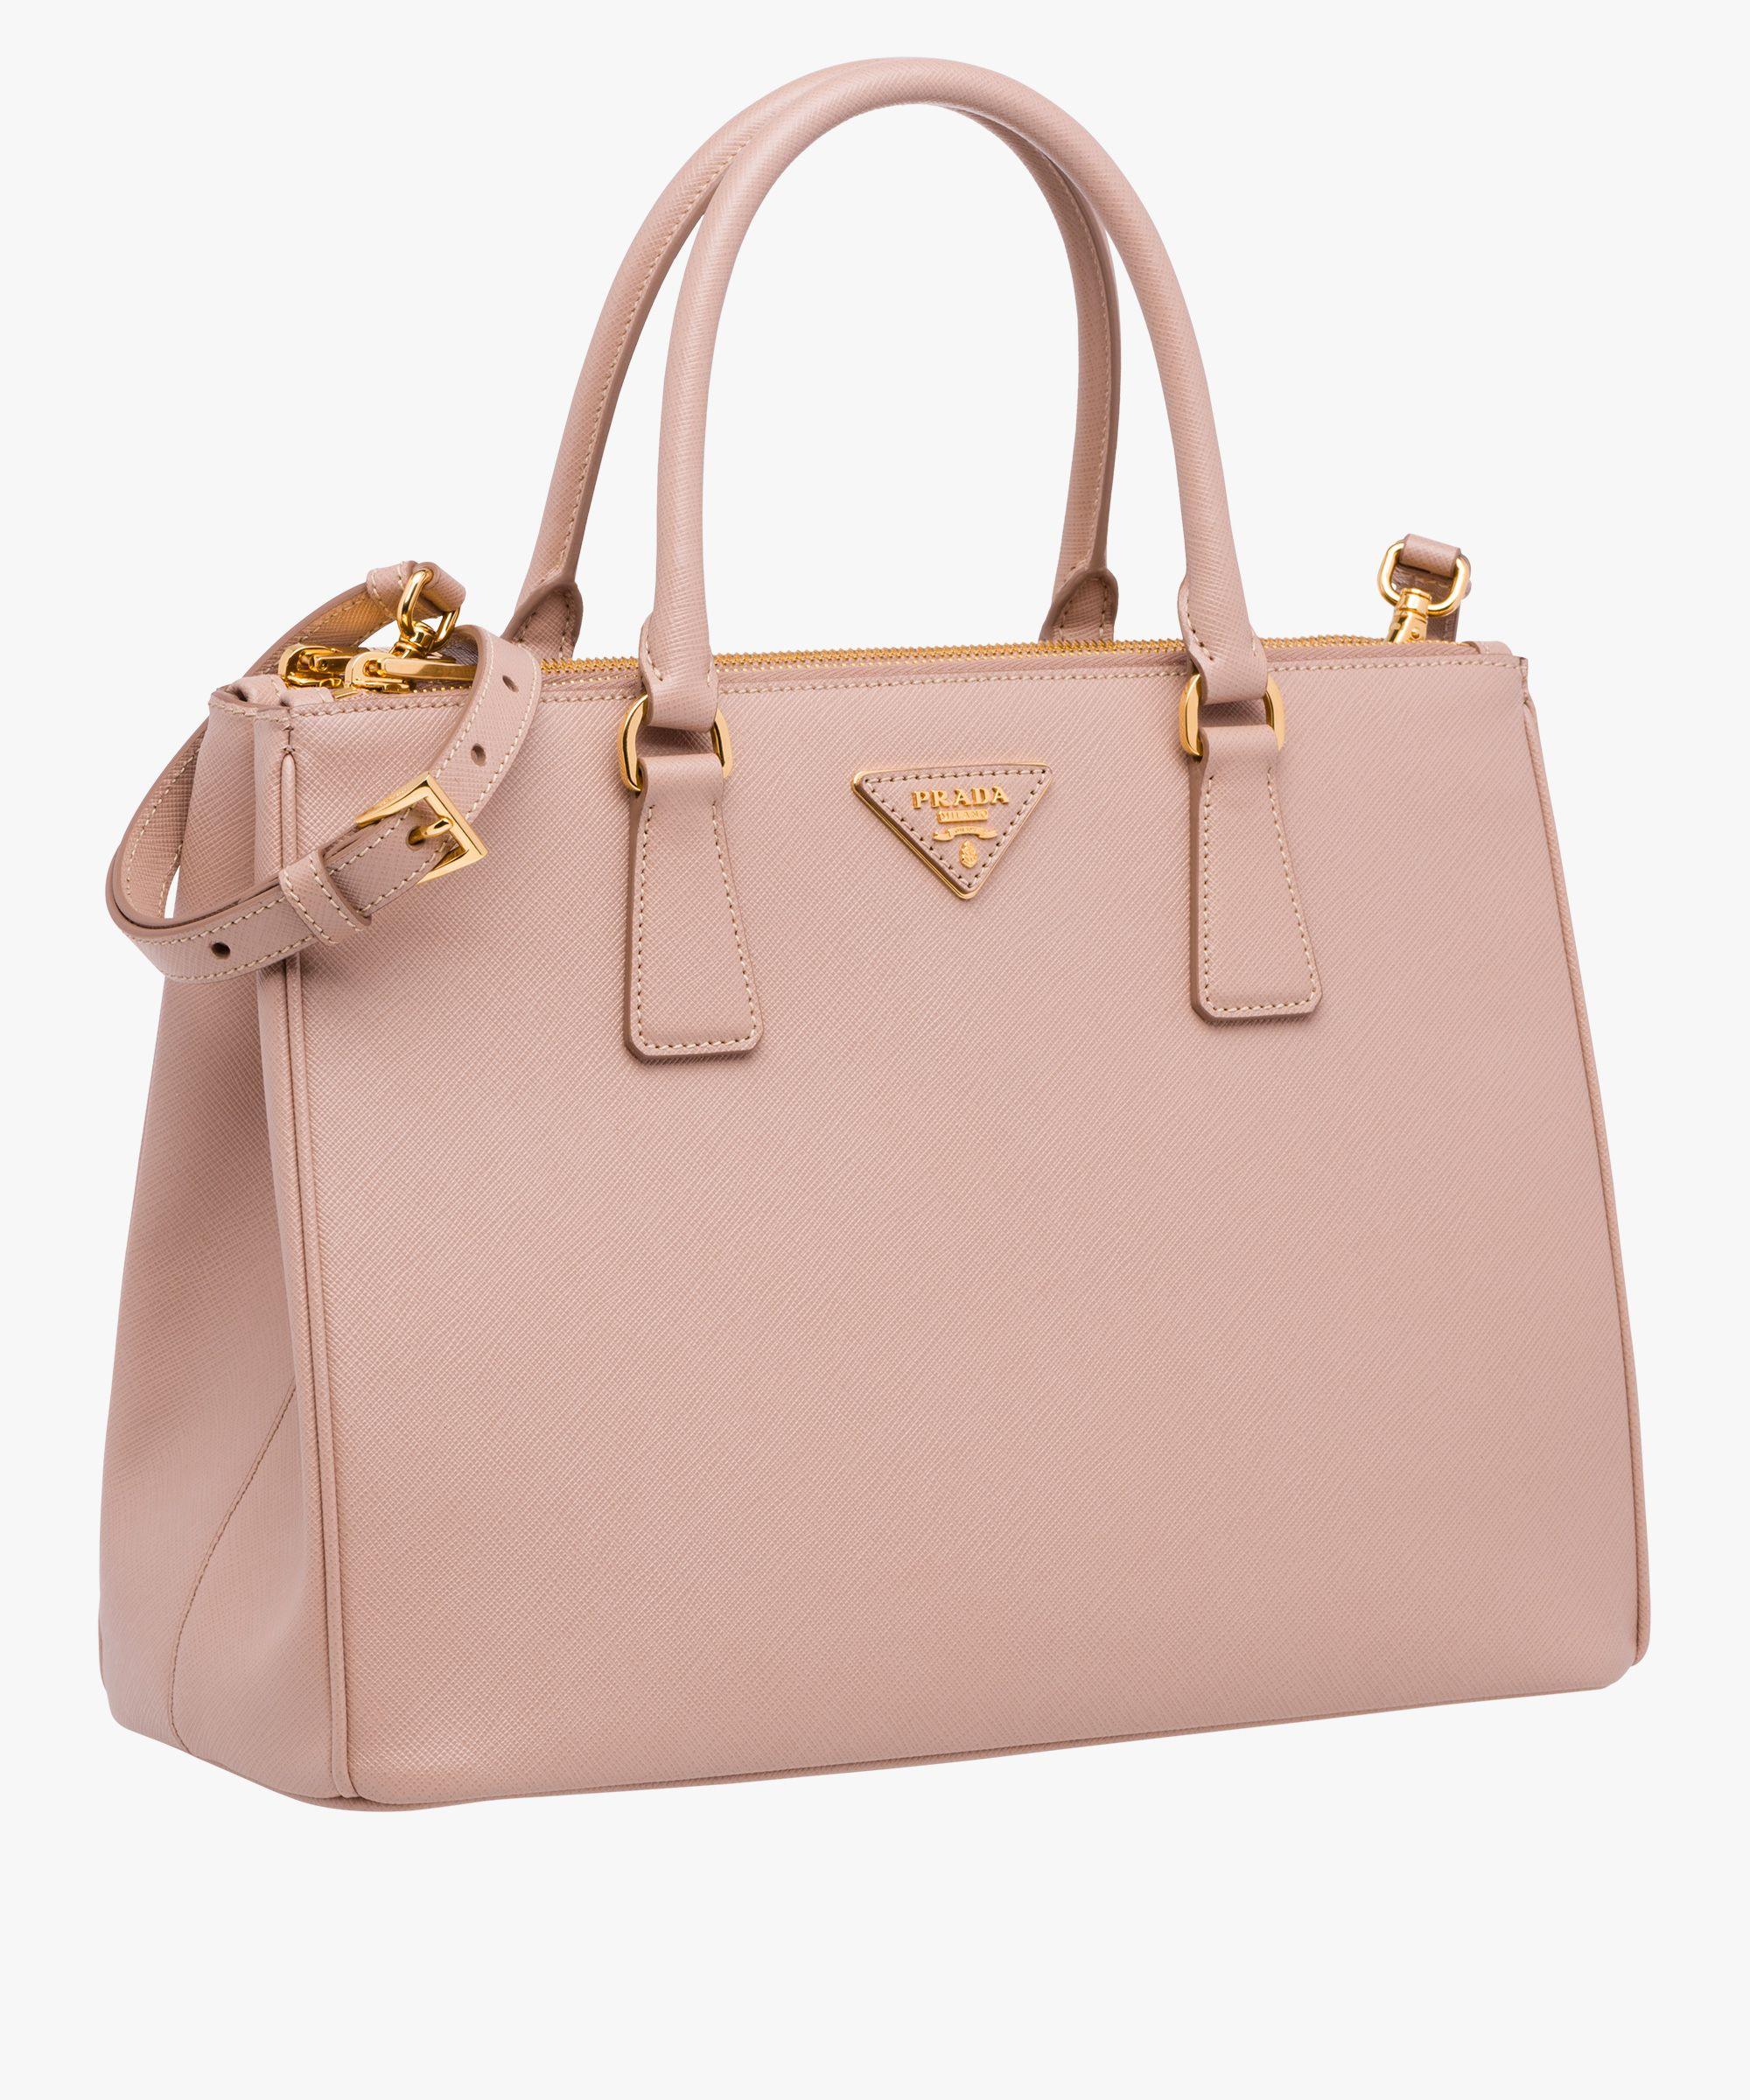 7675b7ce14b Galleria Saffiano leather bag in 2019 | Wishlist Handbags | Prada ...